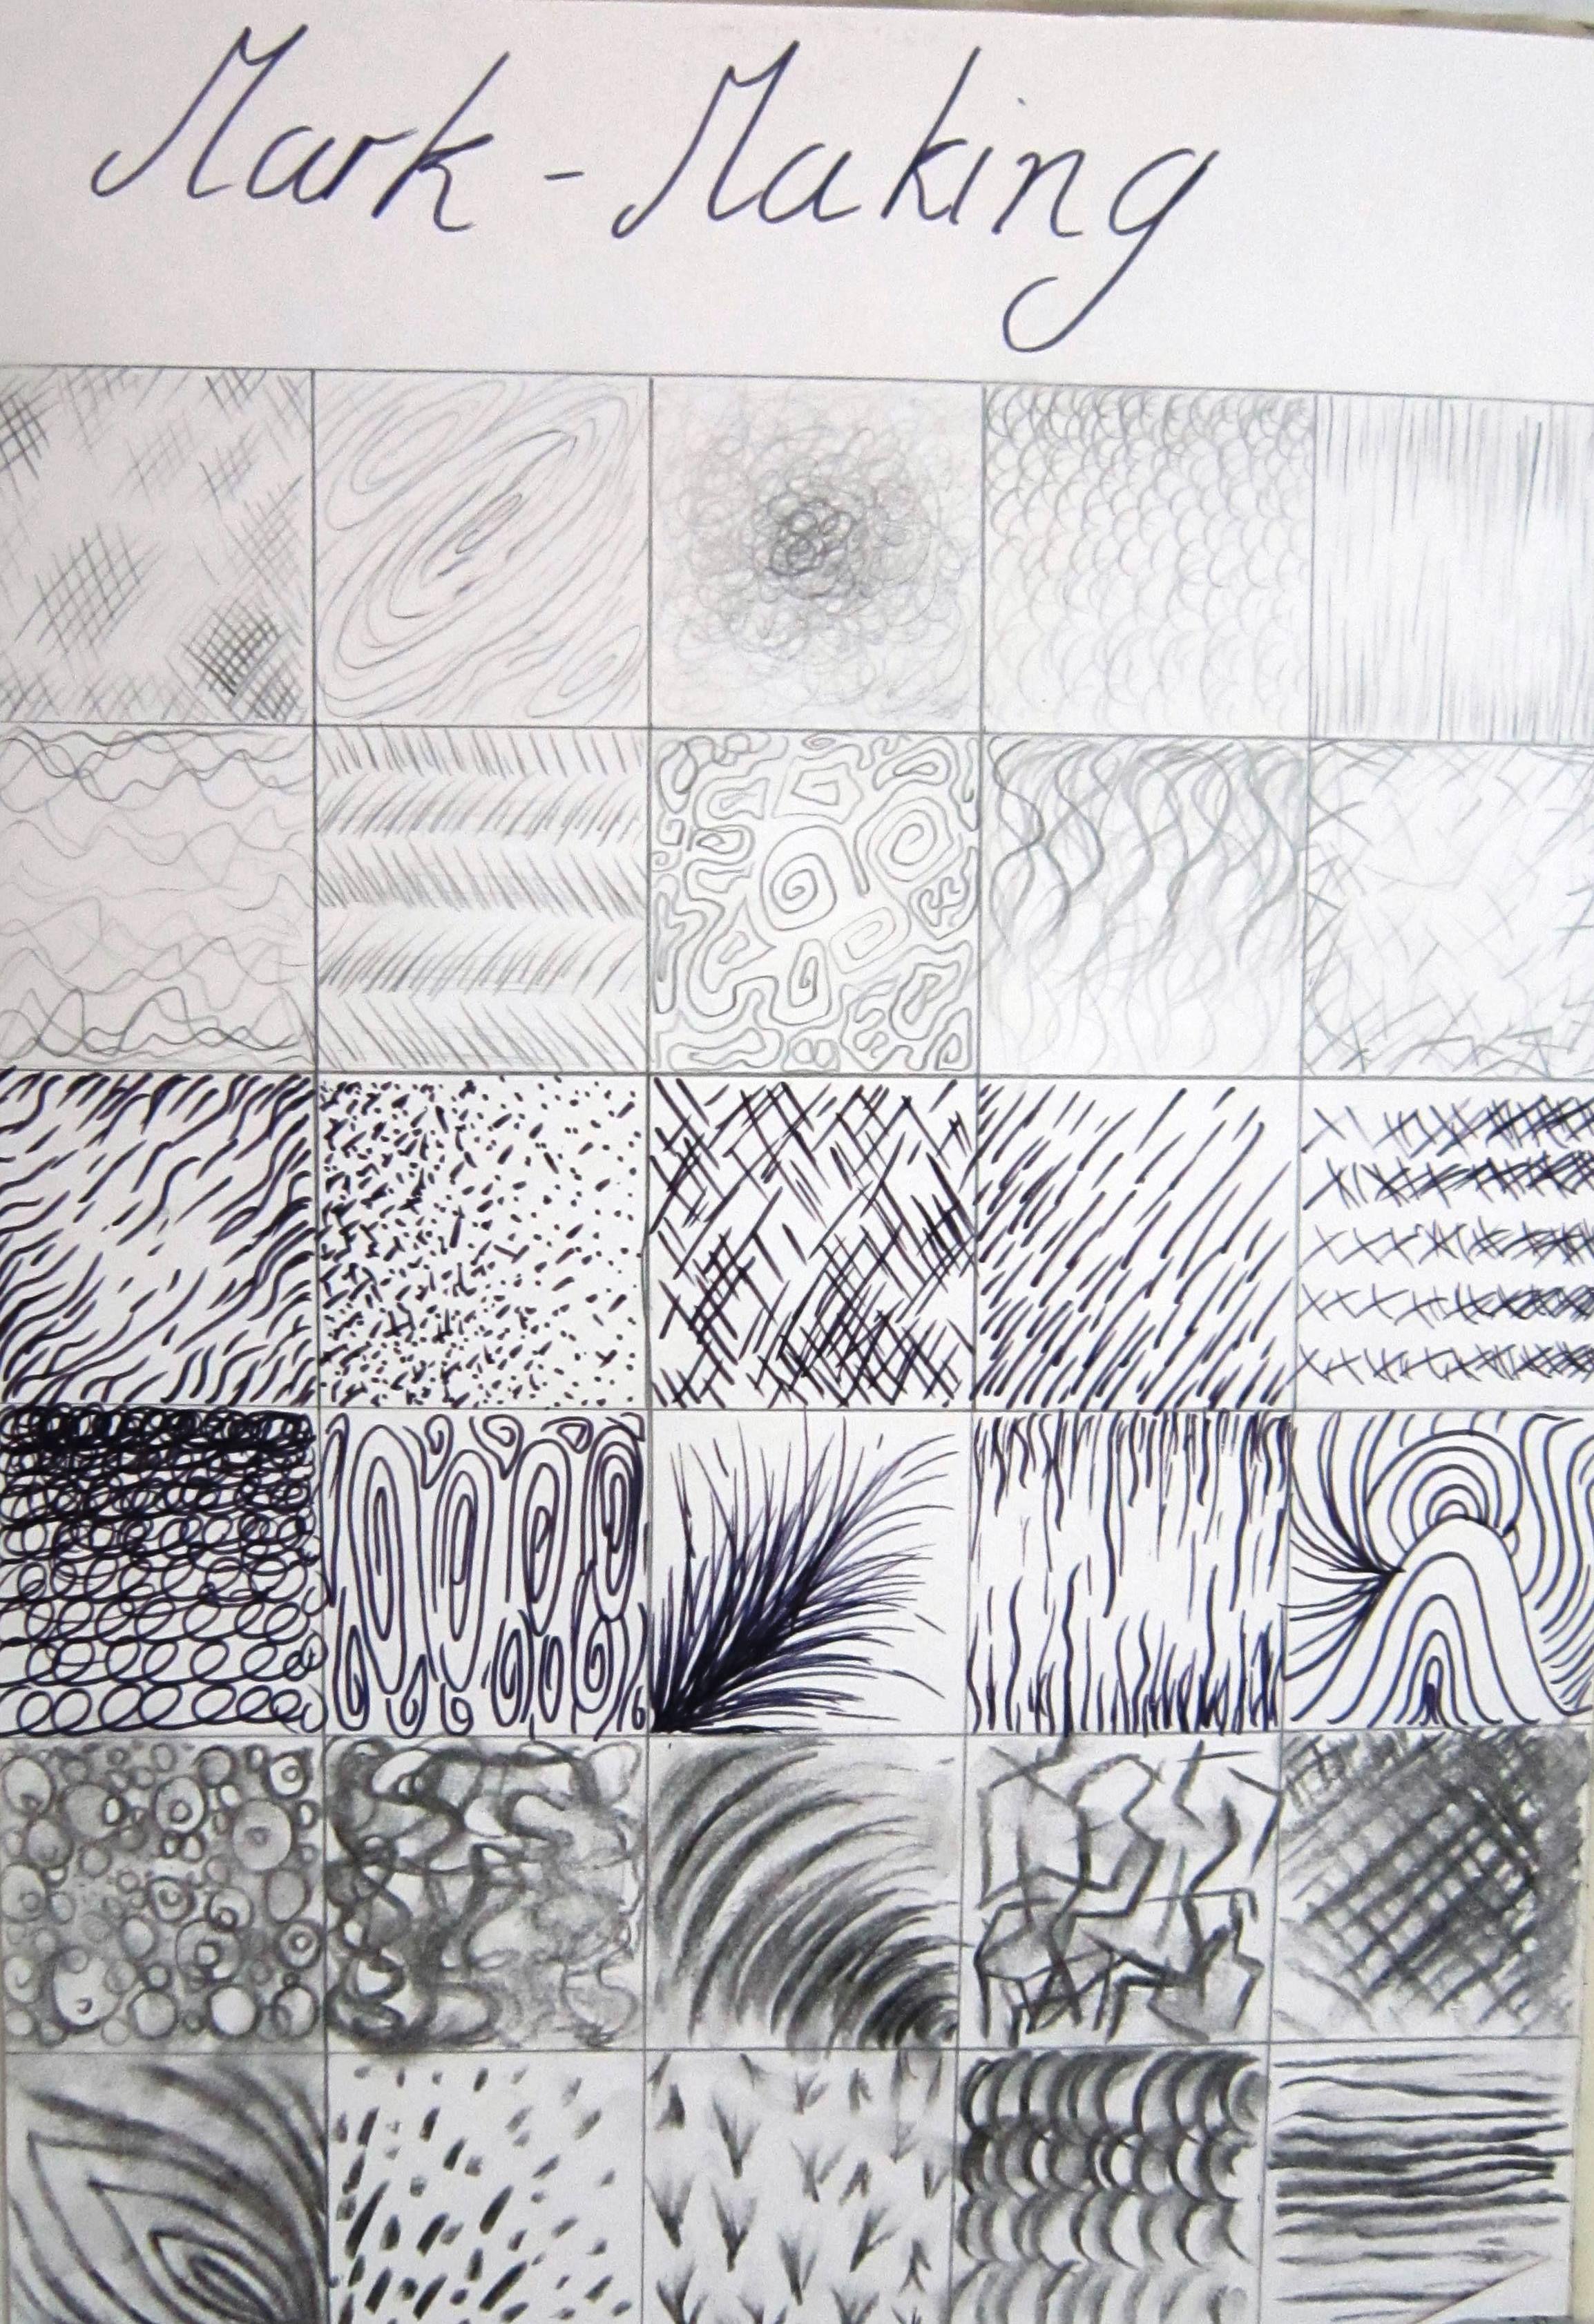 Mark making, pencil, pen, charcoal | Zentangles/Drawings patterns ...